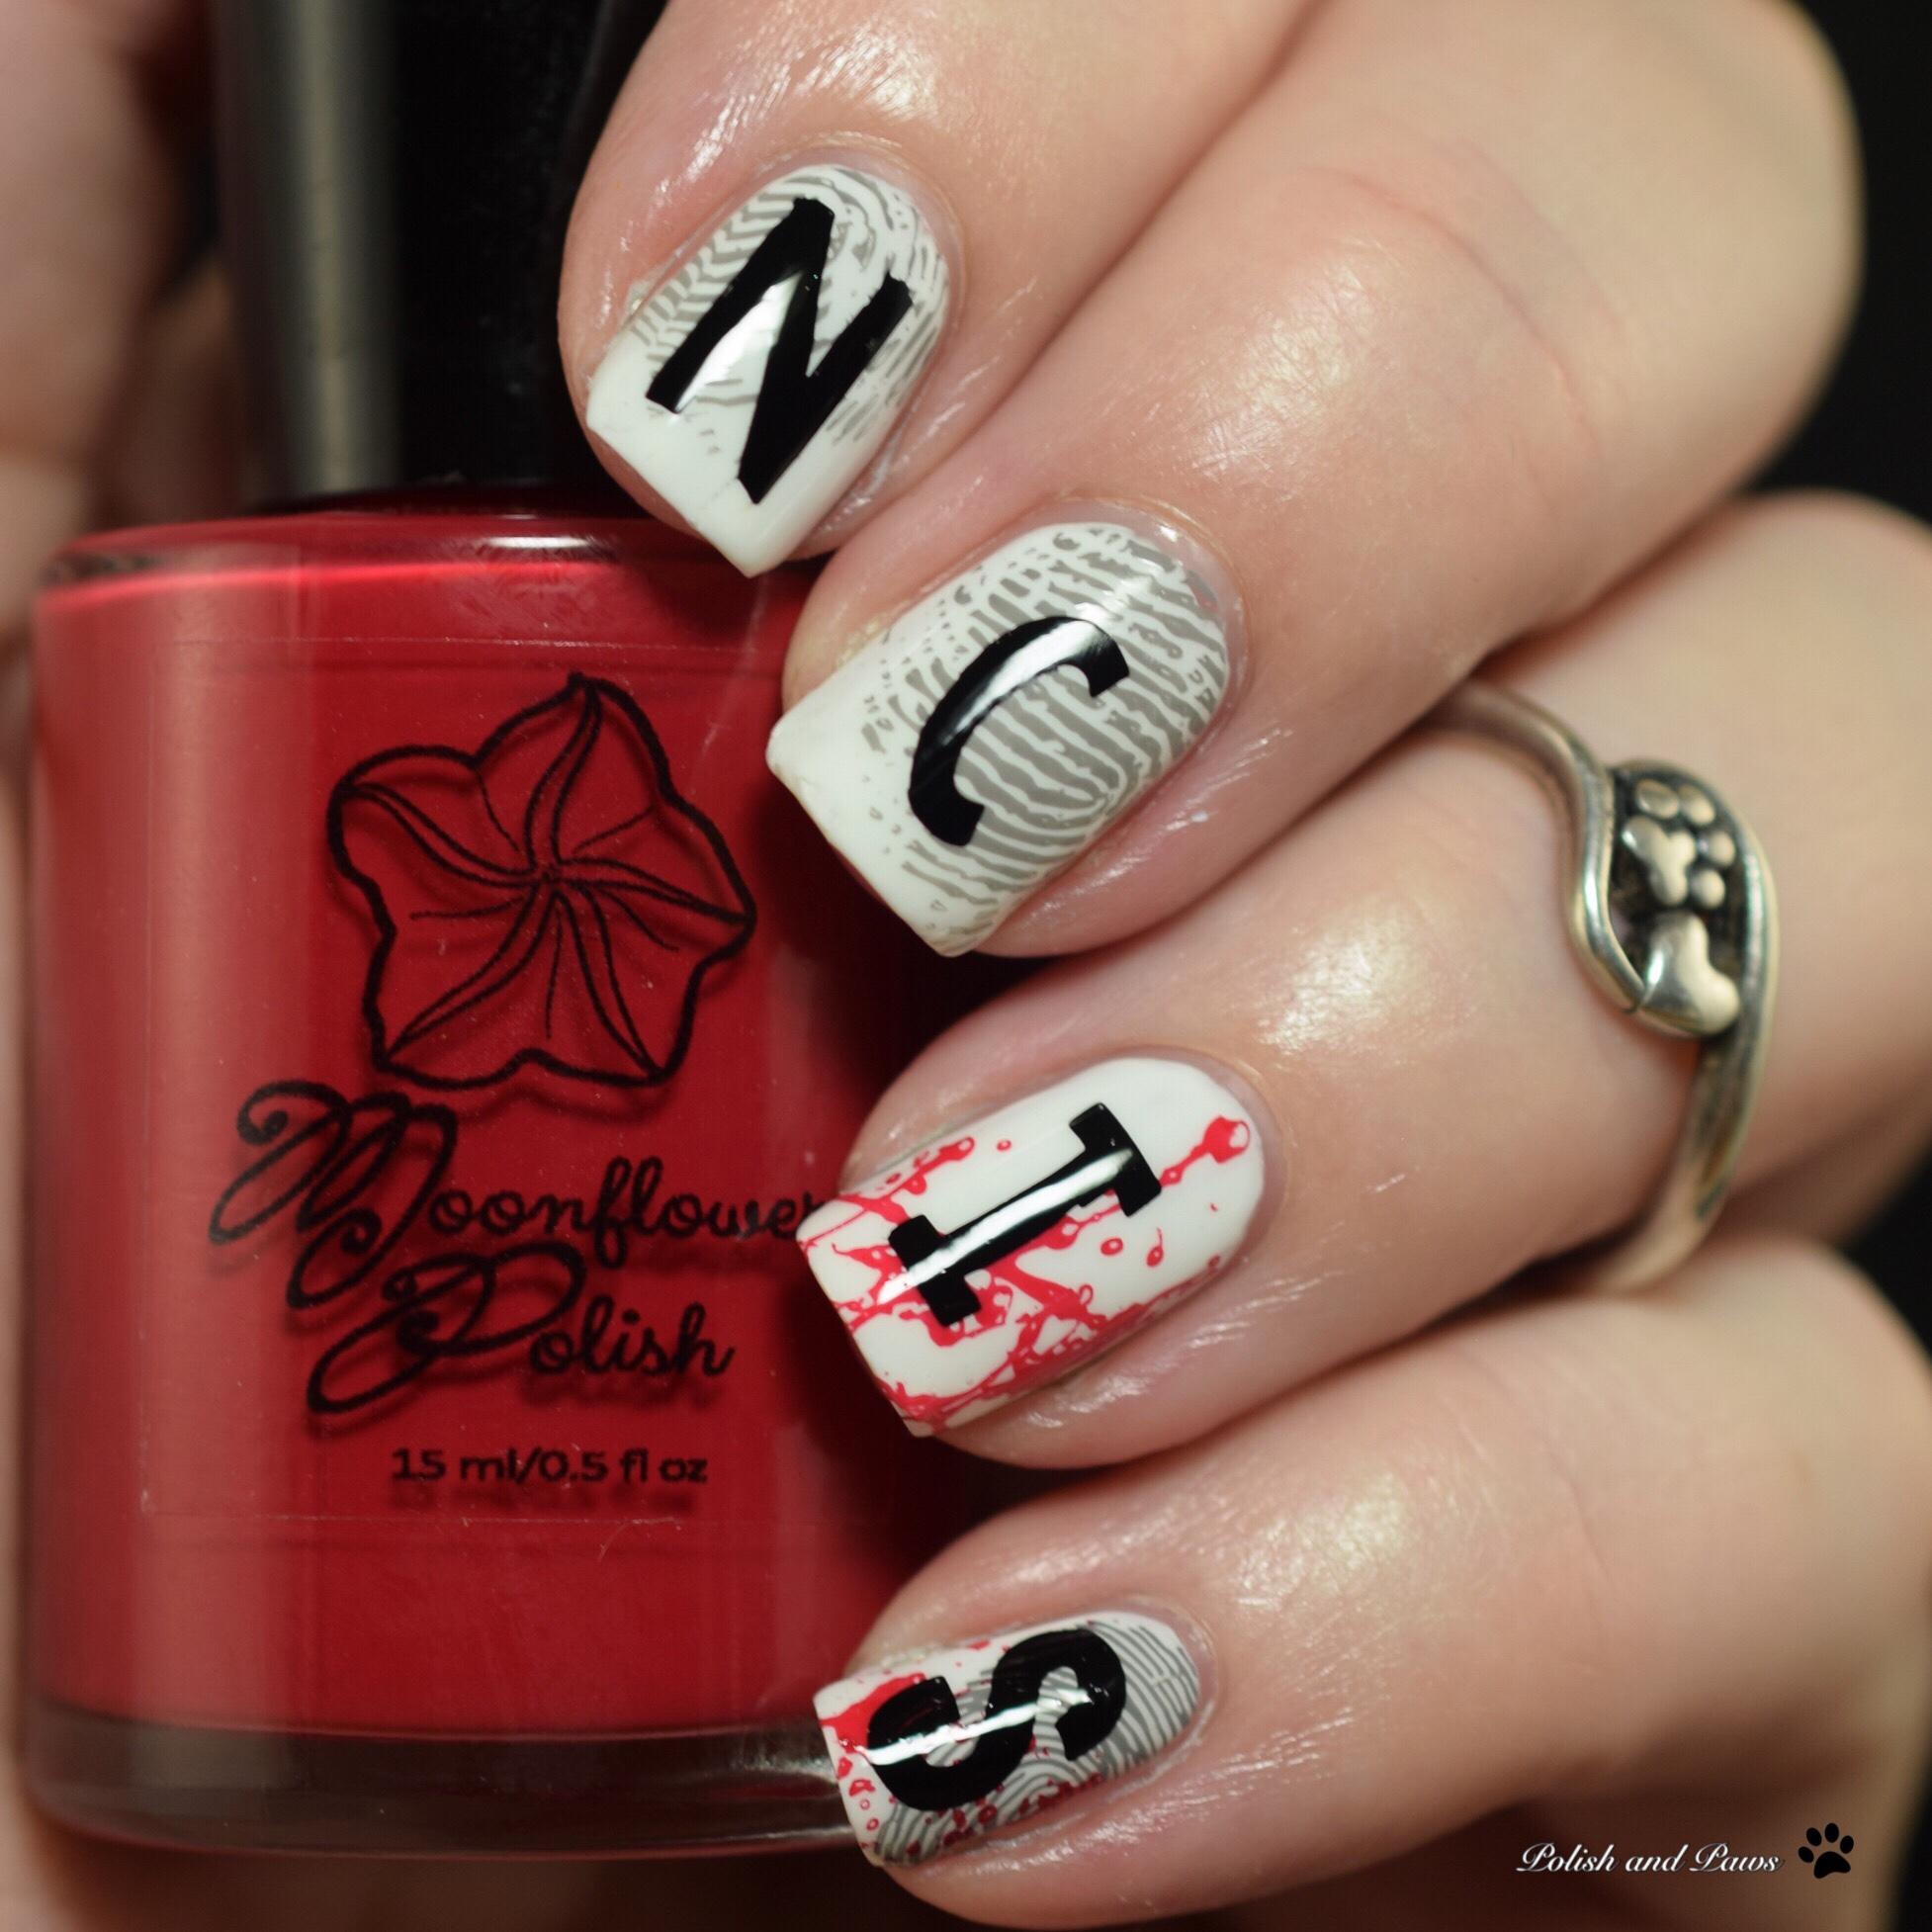 Polish and Paws NCIS inspired nails